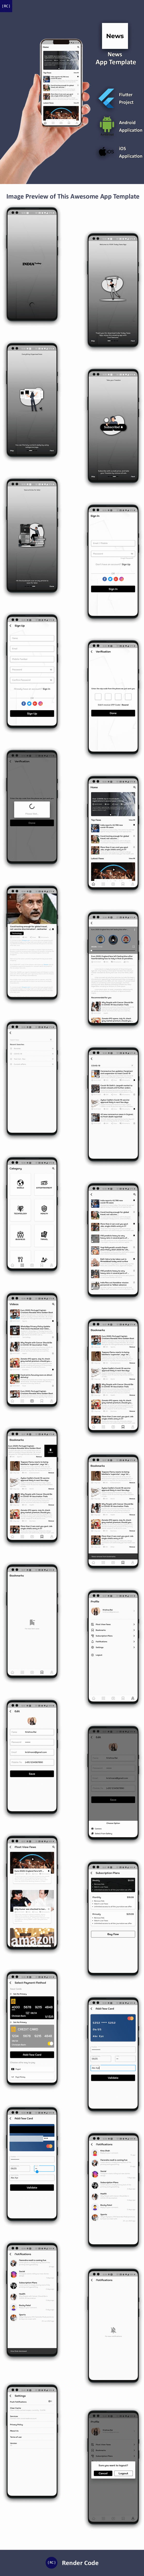 News Android App + News iOS App Template | Flutter | NewsApp - 5